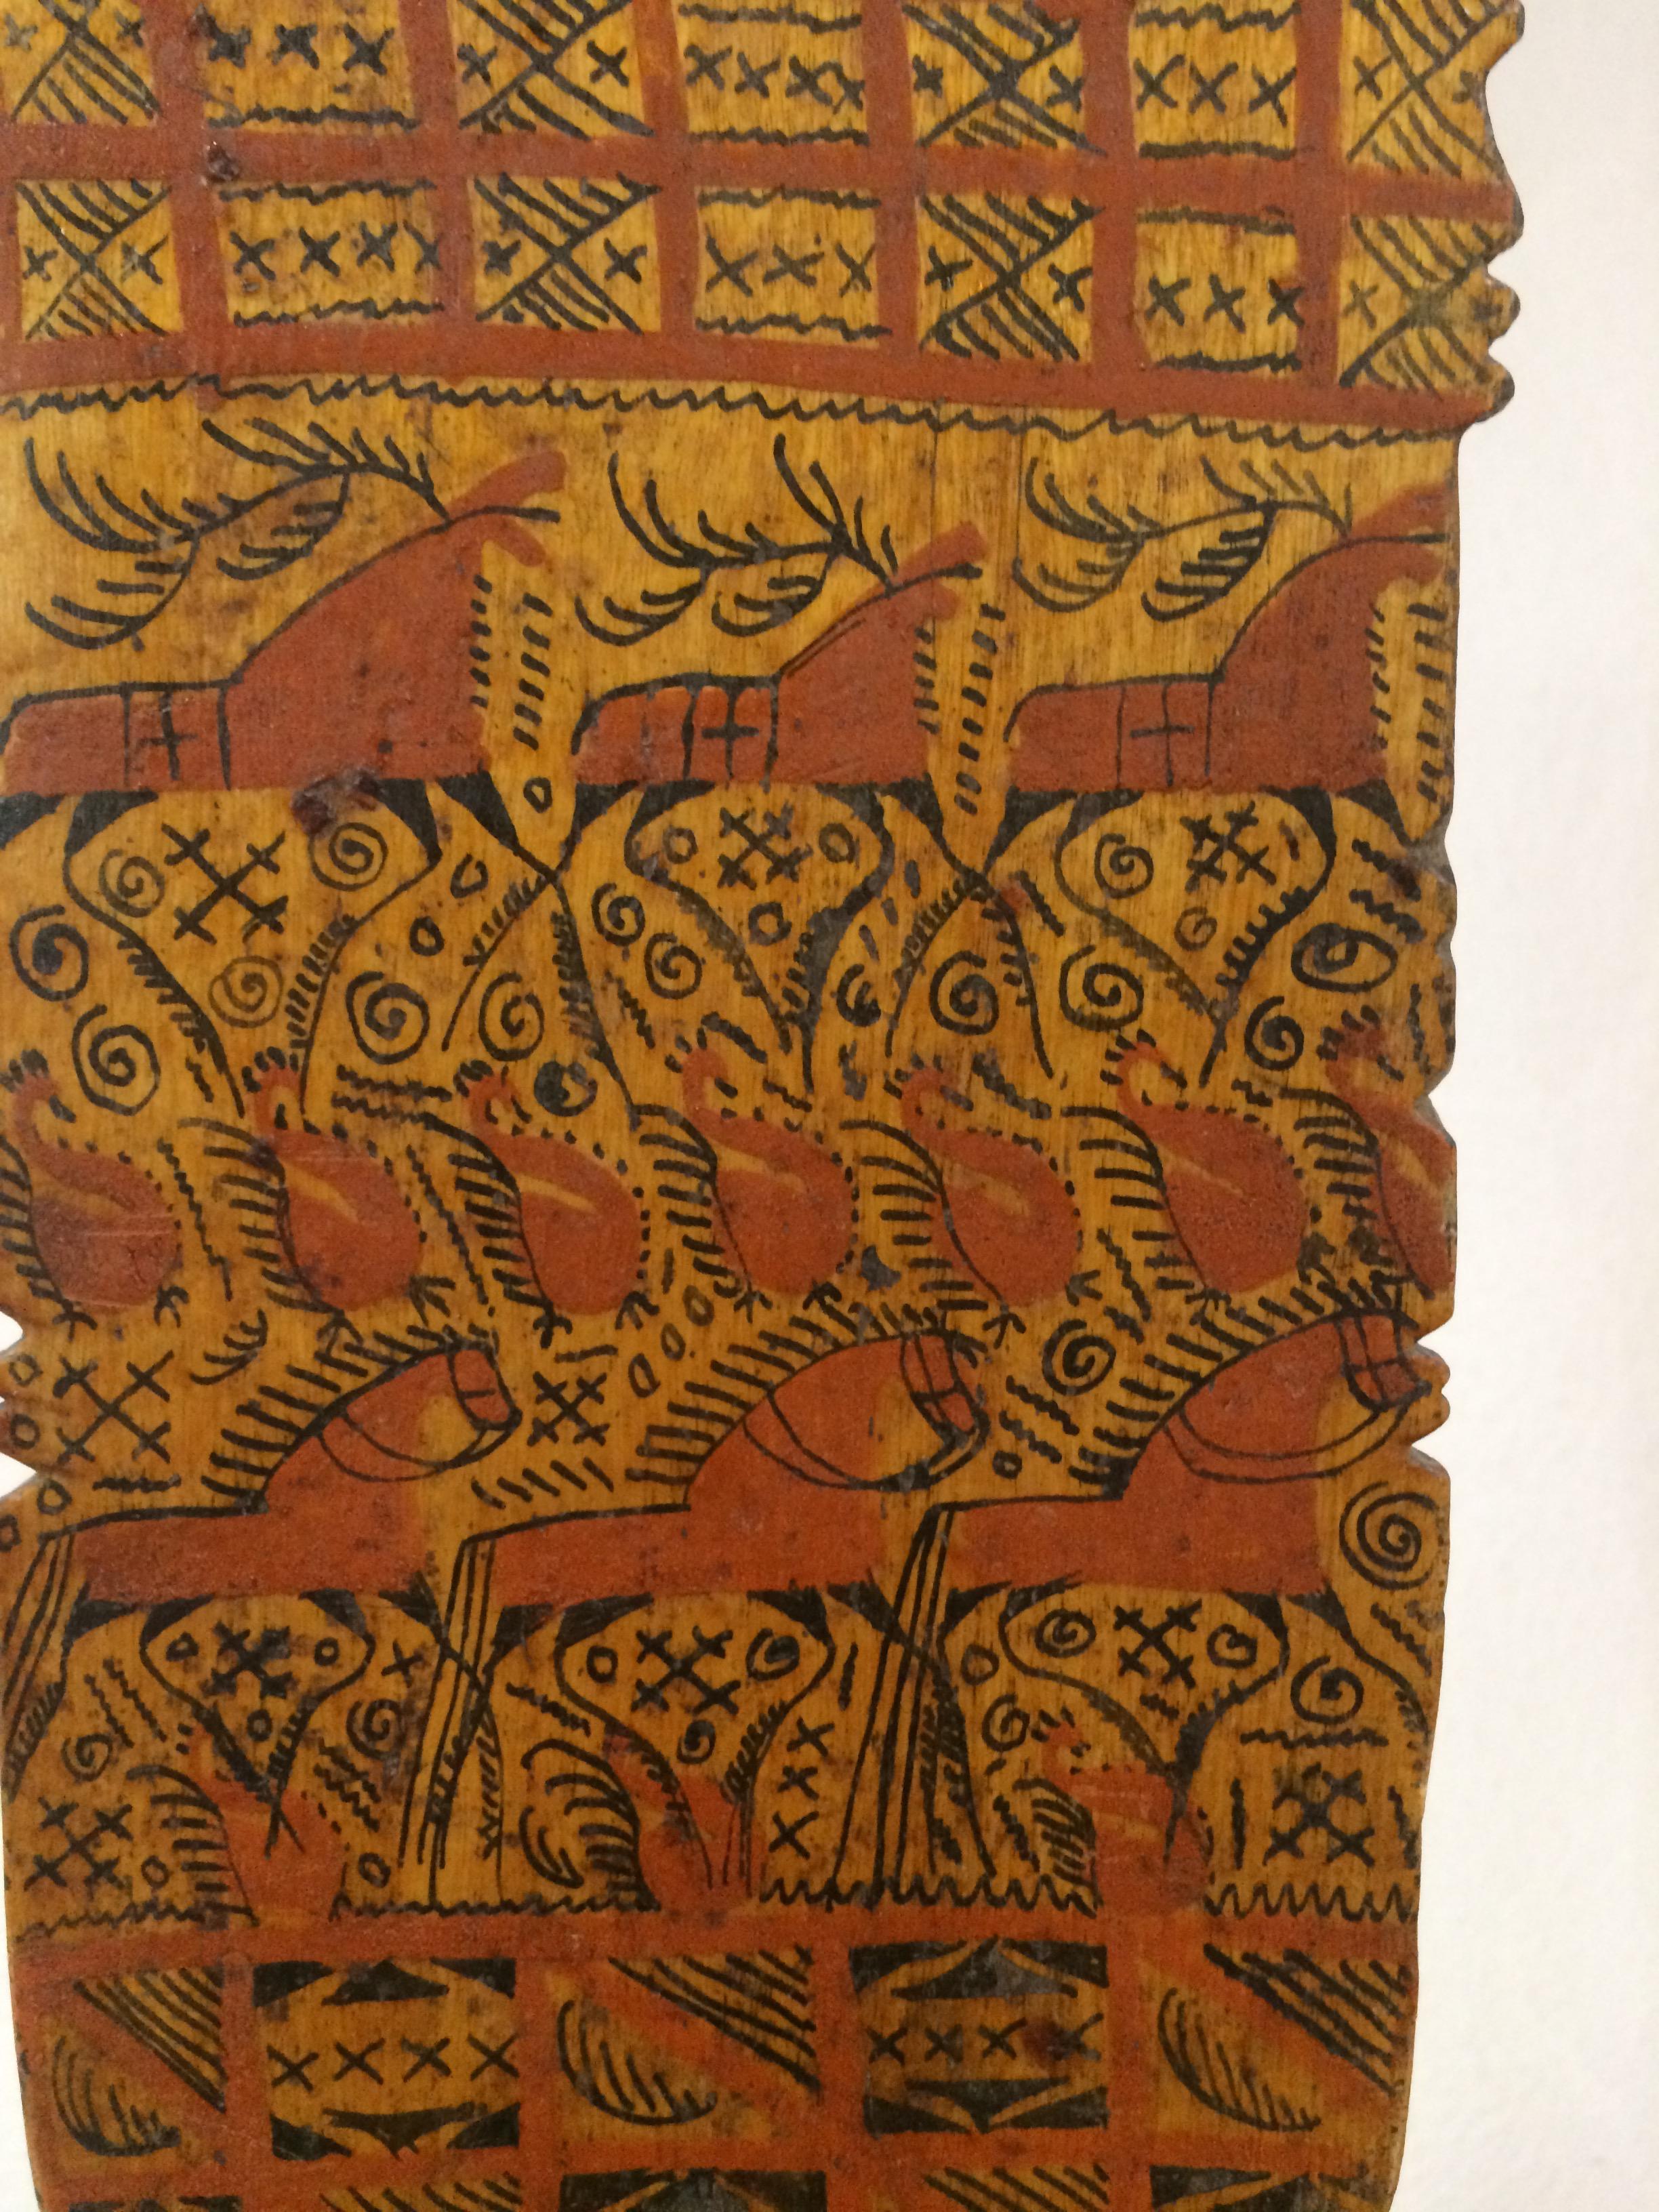 Detail of Mezen Carder, including images of caribou, horses, and symbology.